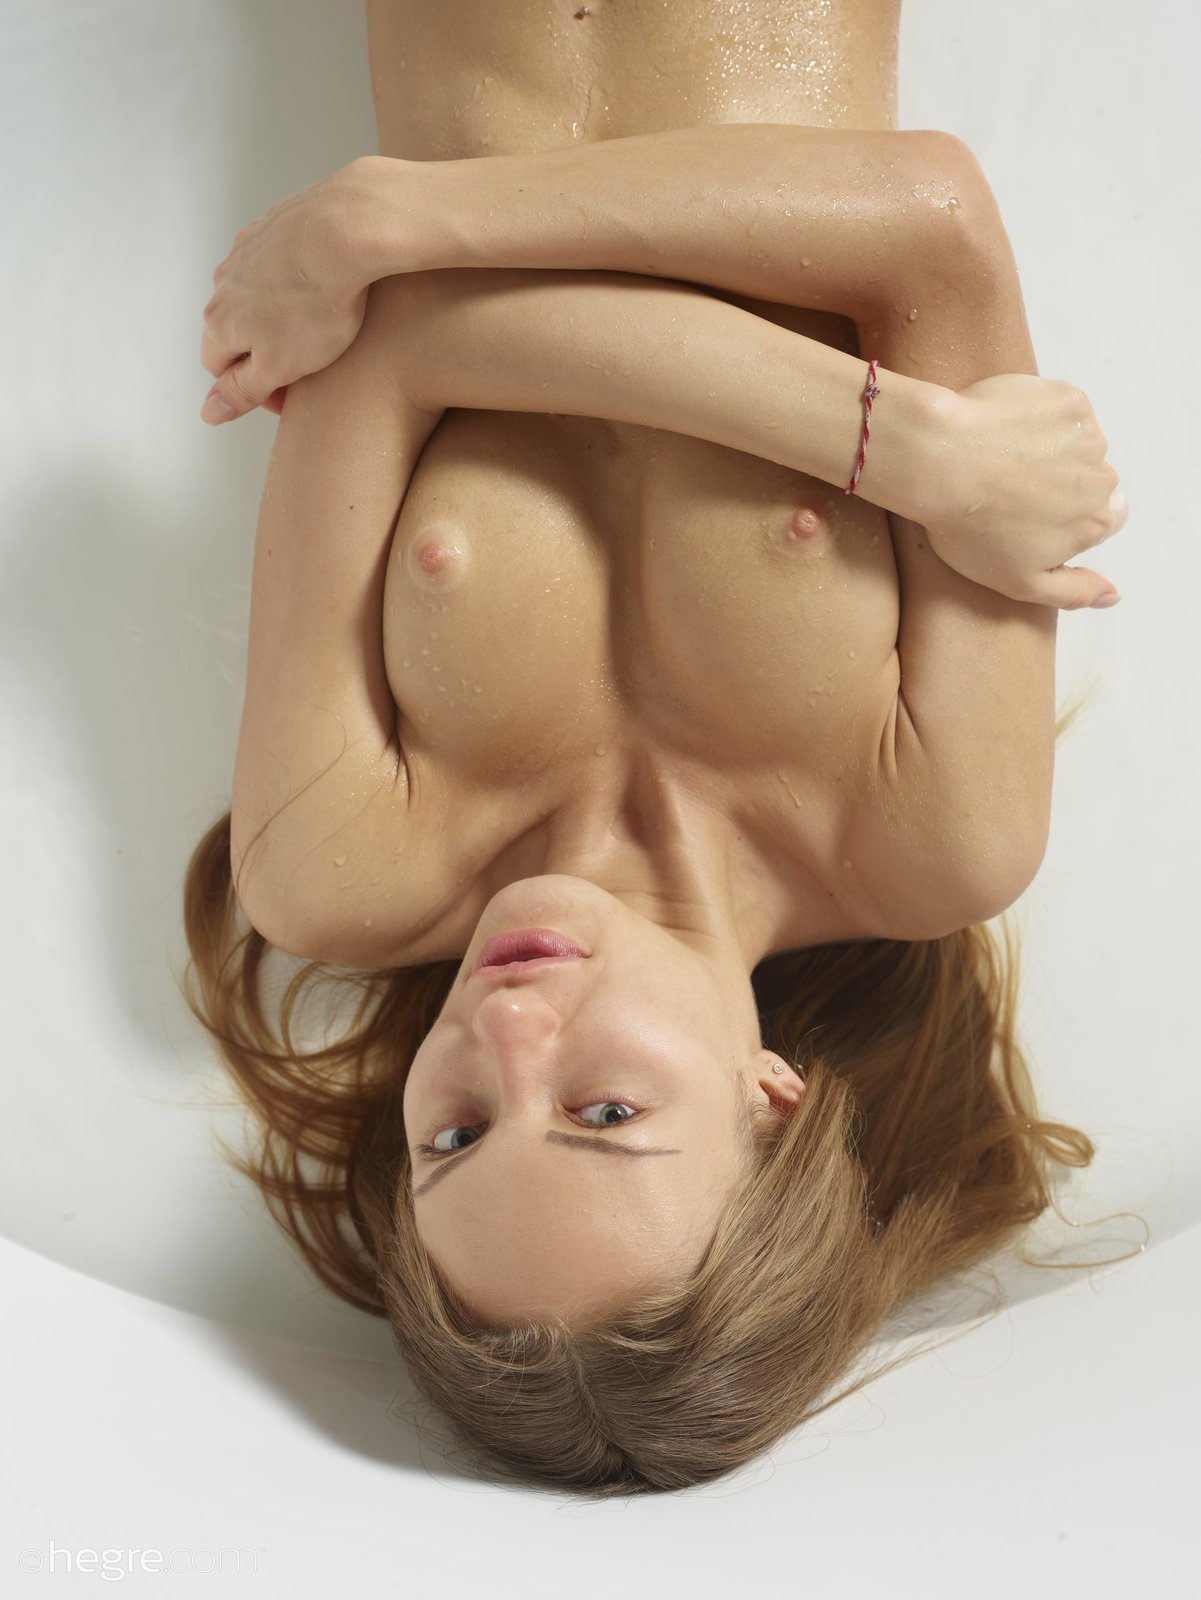 Zdjęcie porno - 0414 - Naga modelka